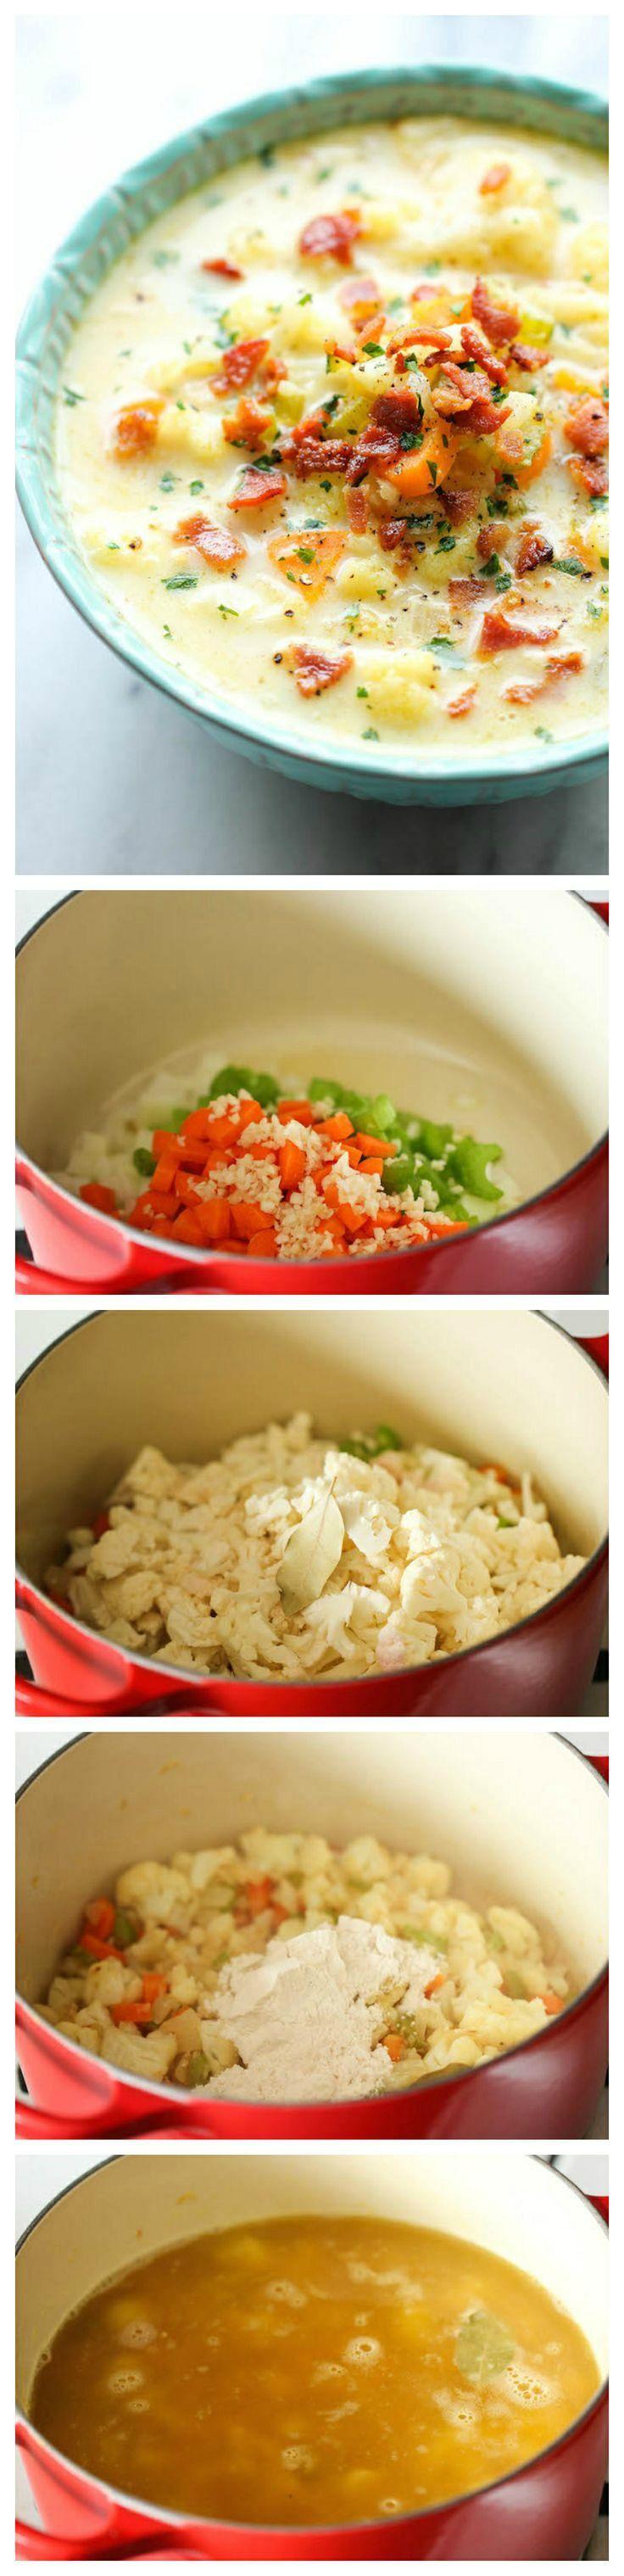 Cauliflower Chowder A creamy, low carb, hearty and wonderfully cozy soup. Well yum!